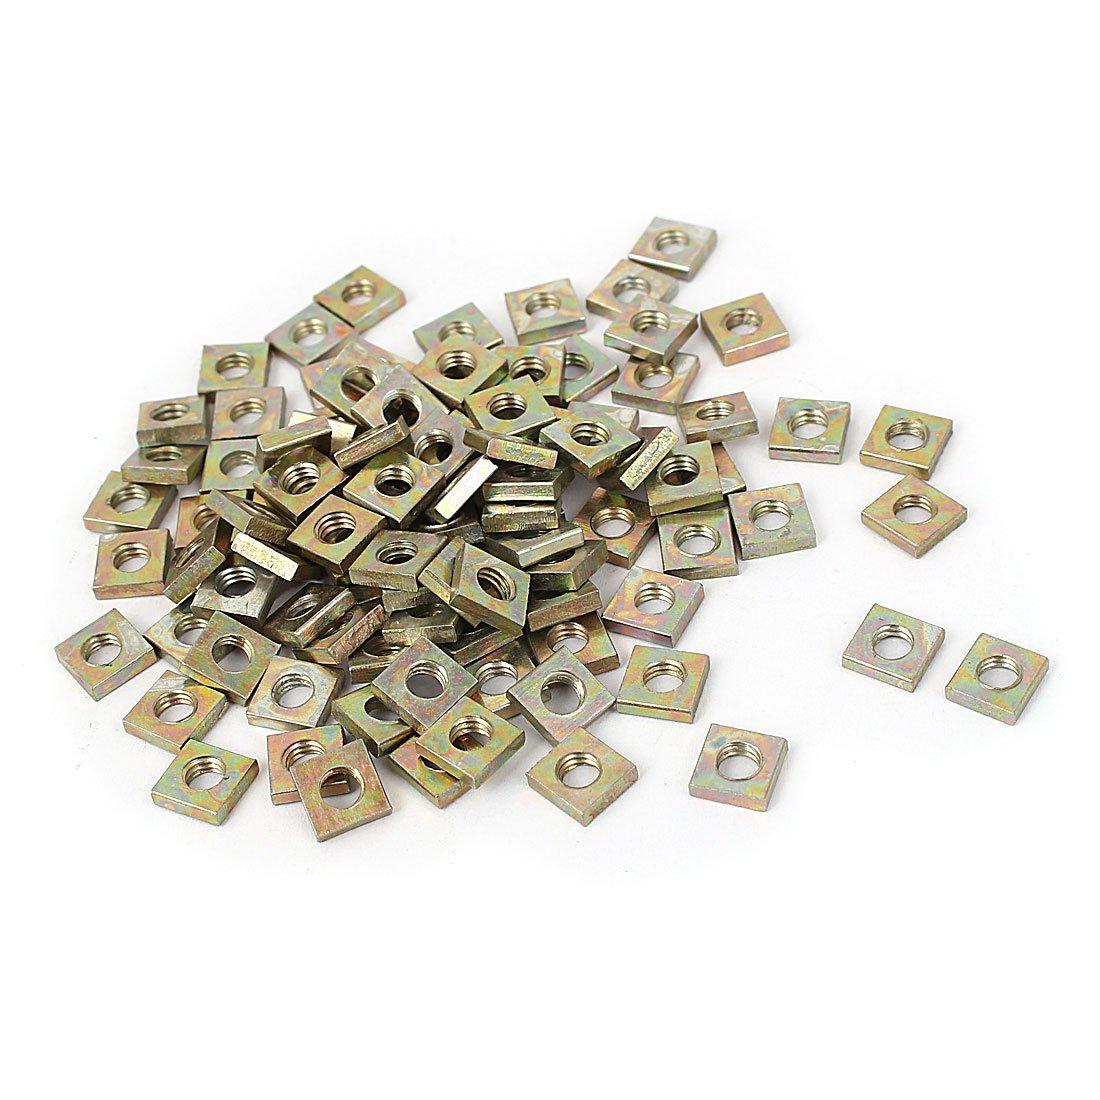 Sourcingmap® M4x7x2mm Yellow Zinc Plated Square Machine Screw Nuts Fastener 100pcs a15122800ux0630